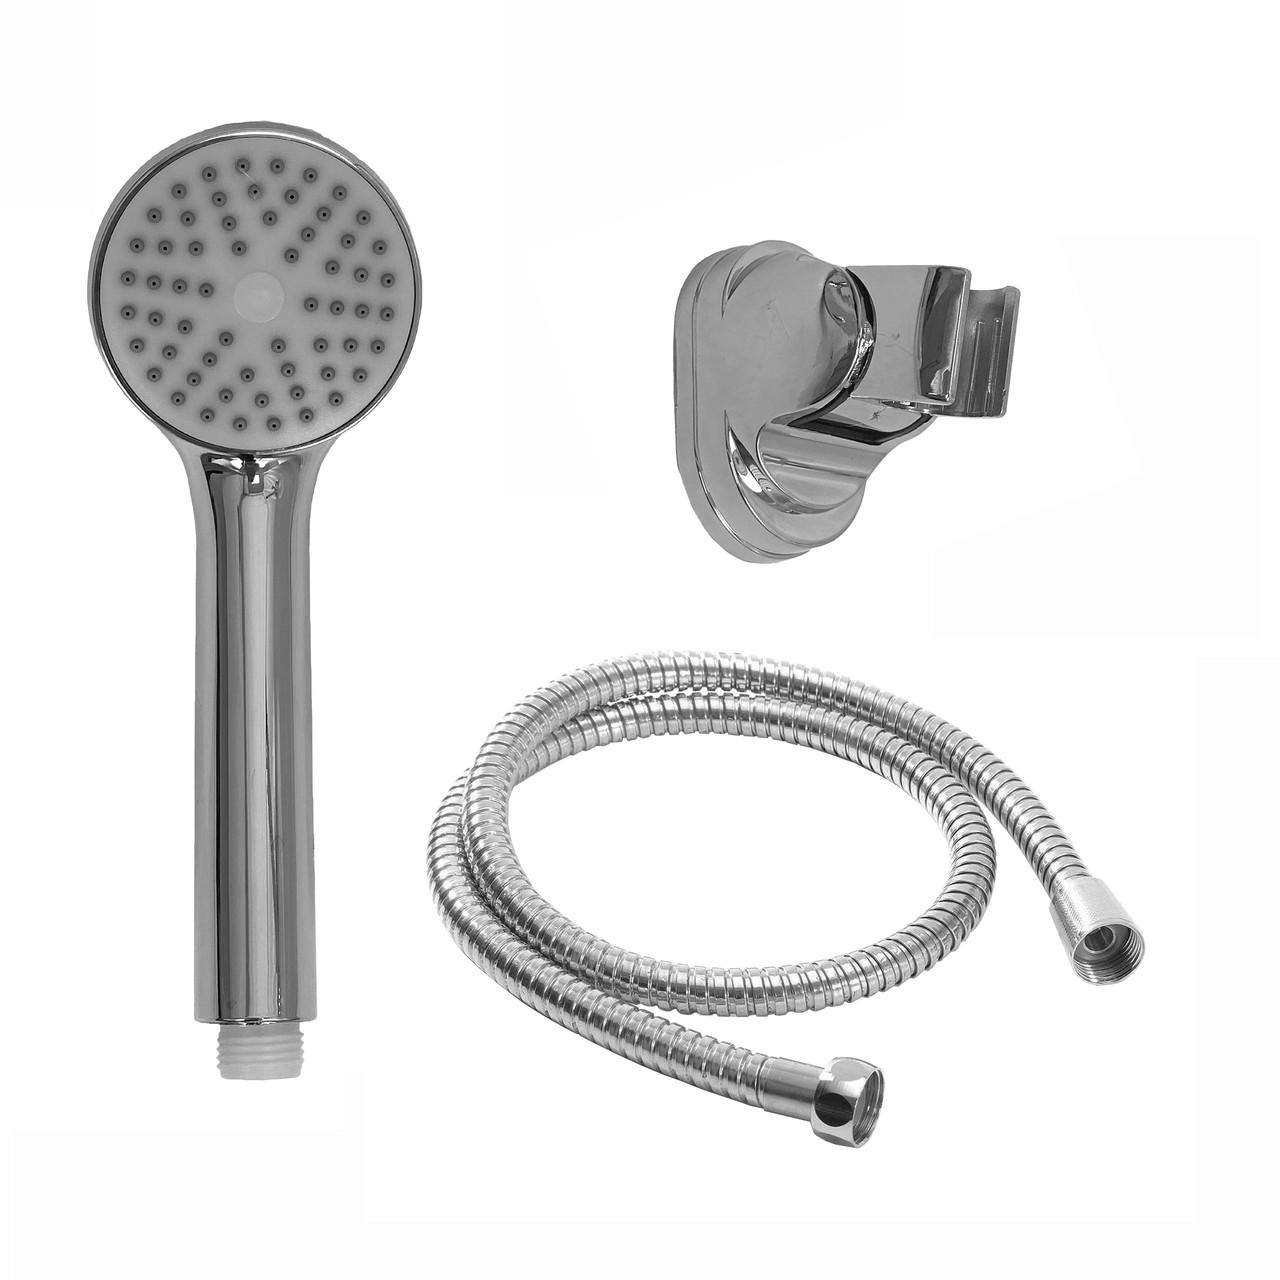 Змішувач для ванни Globus Lux Solly GLSO-0108